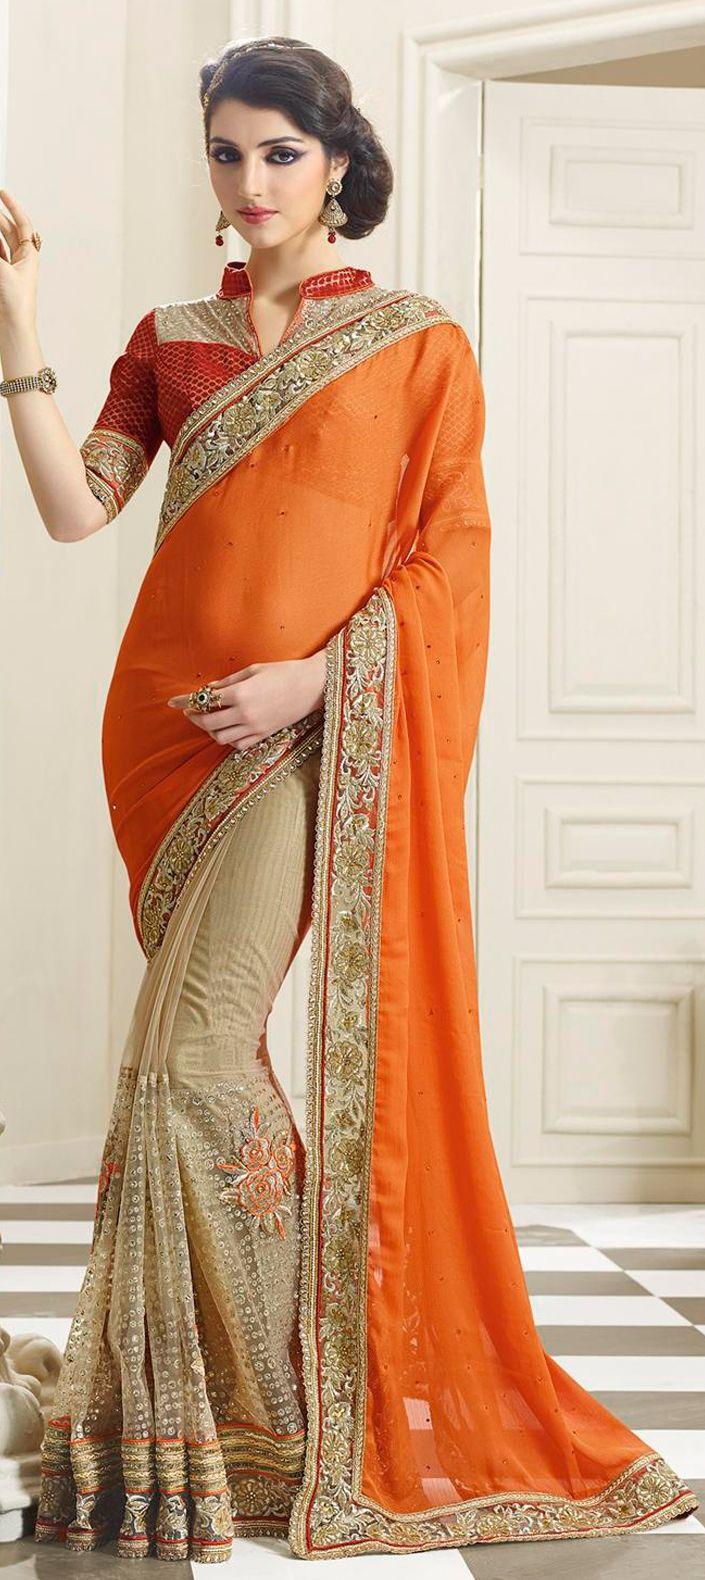 best images about n brides or wedding be wedding ready in this orange saree 178255 beige and brown orange